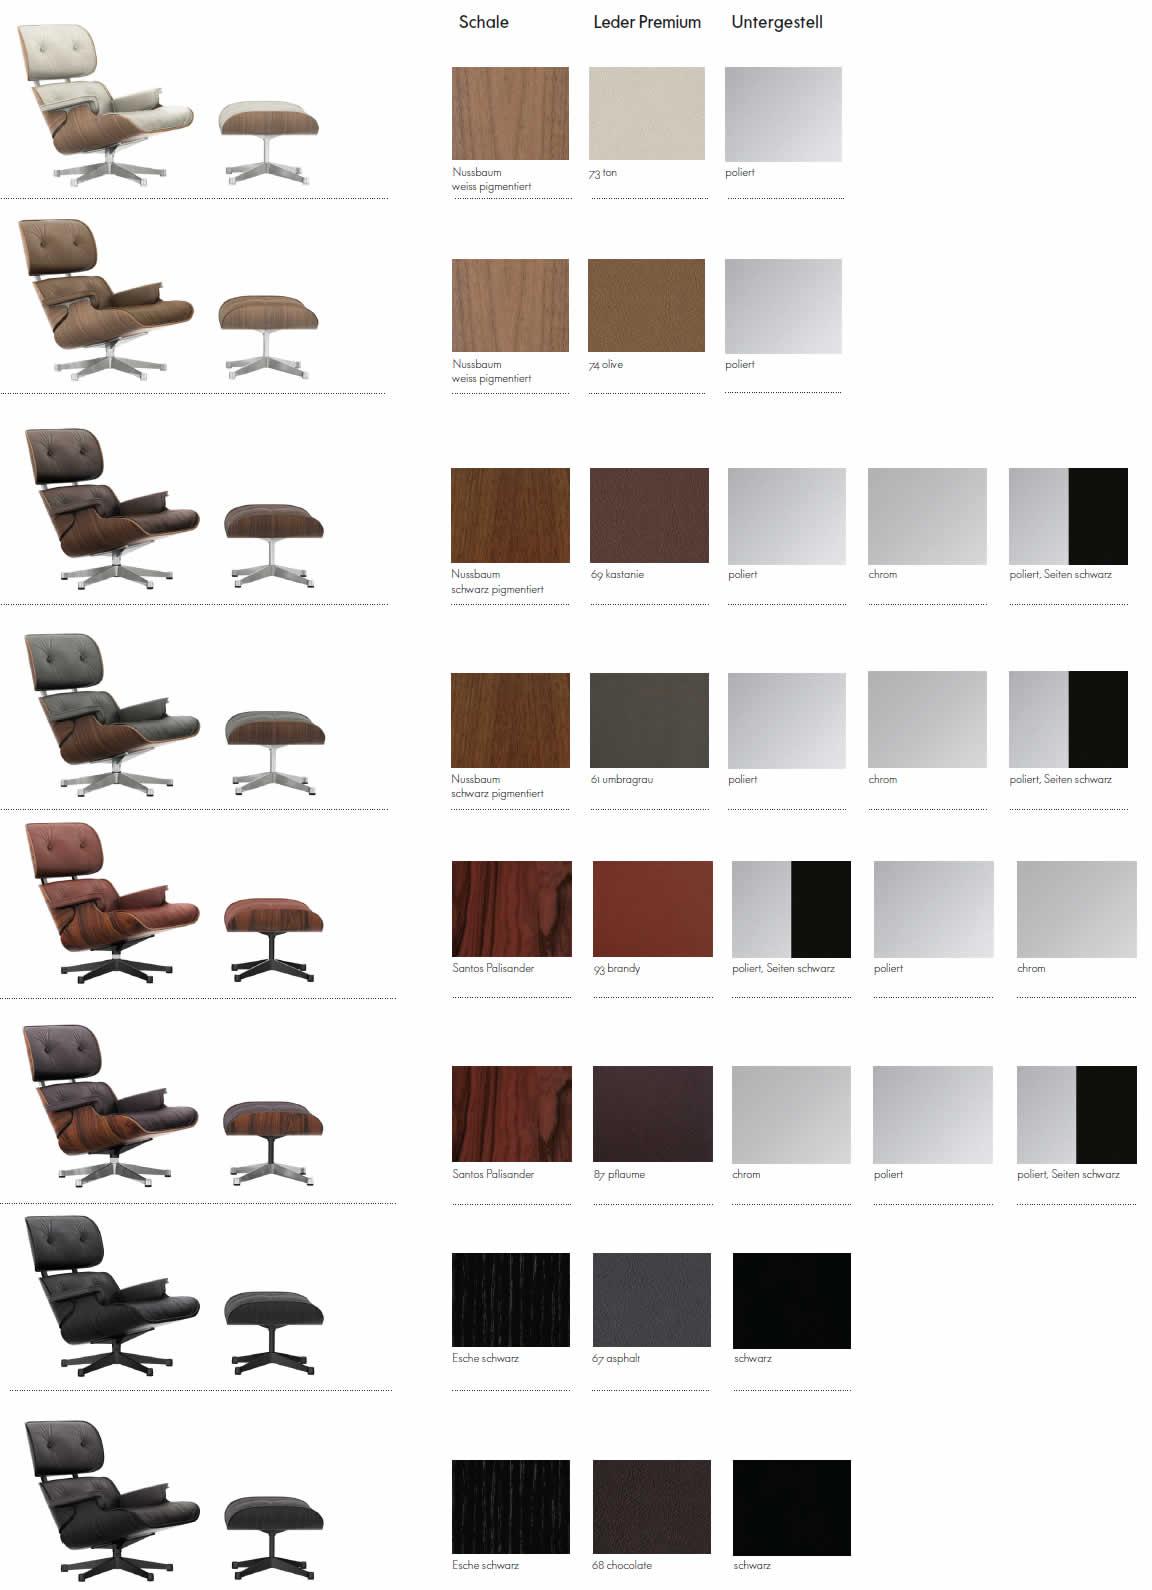 vitra-lounge-chair-beauty-version_varianten